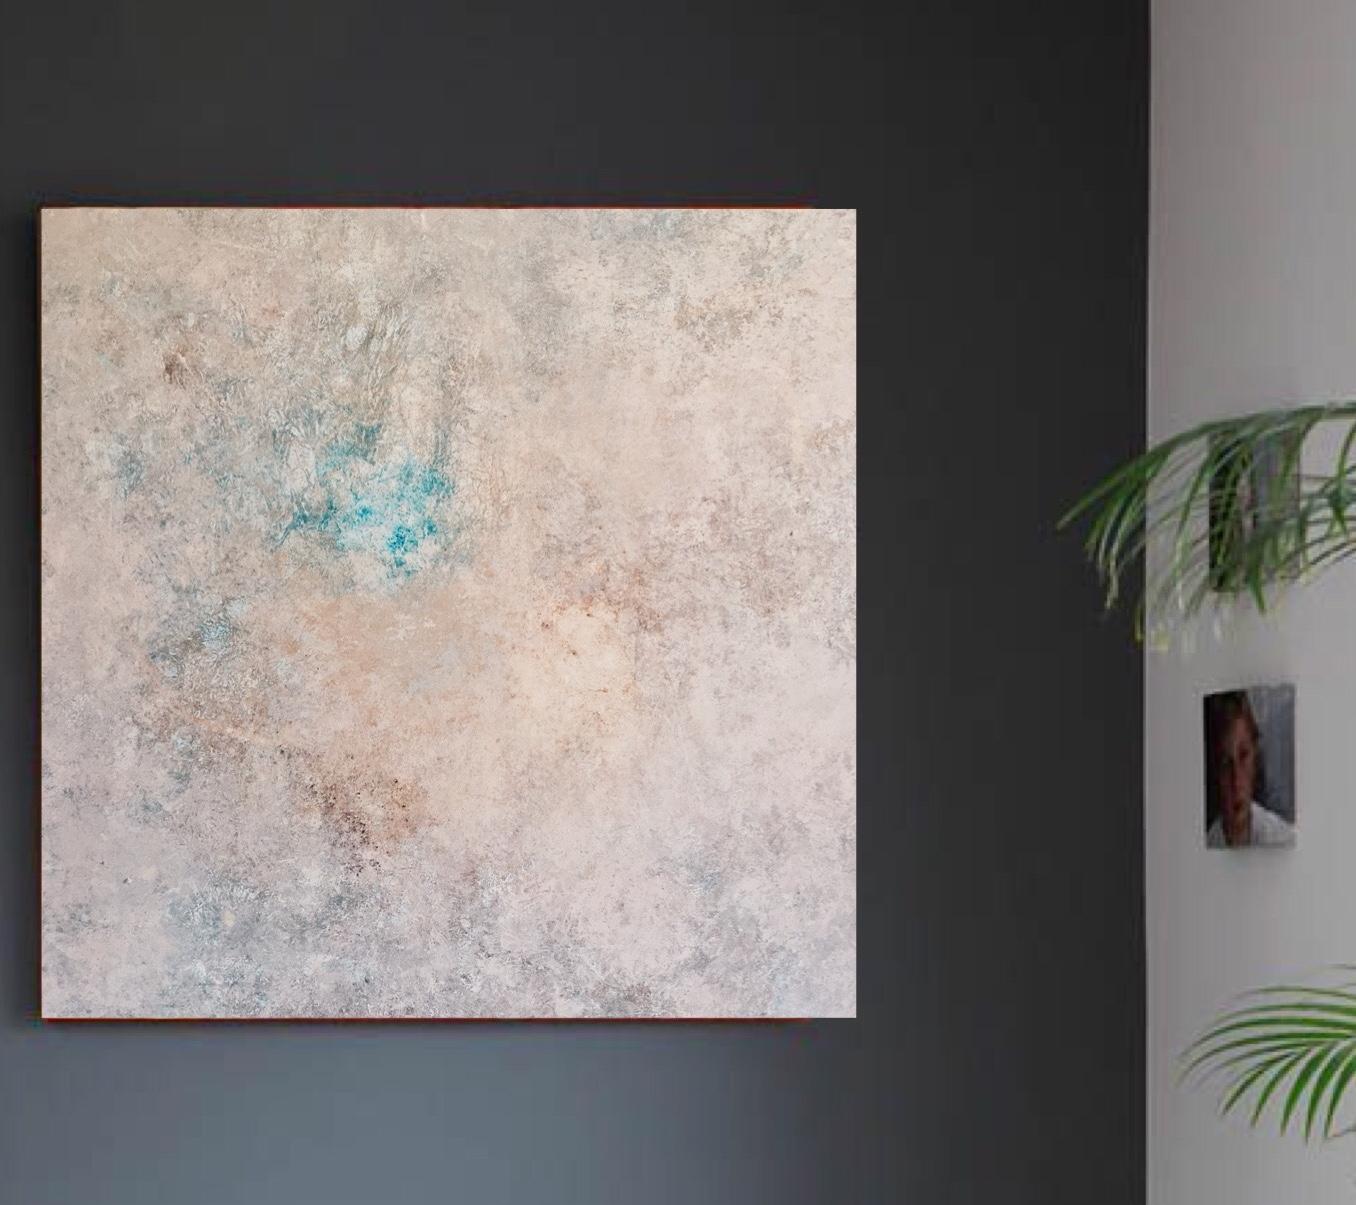 Marine Bonzom - Artiste Peintre Biarritz - Home - Vatnajökull